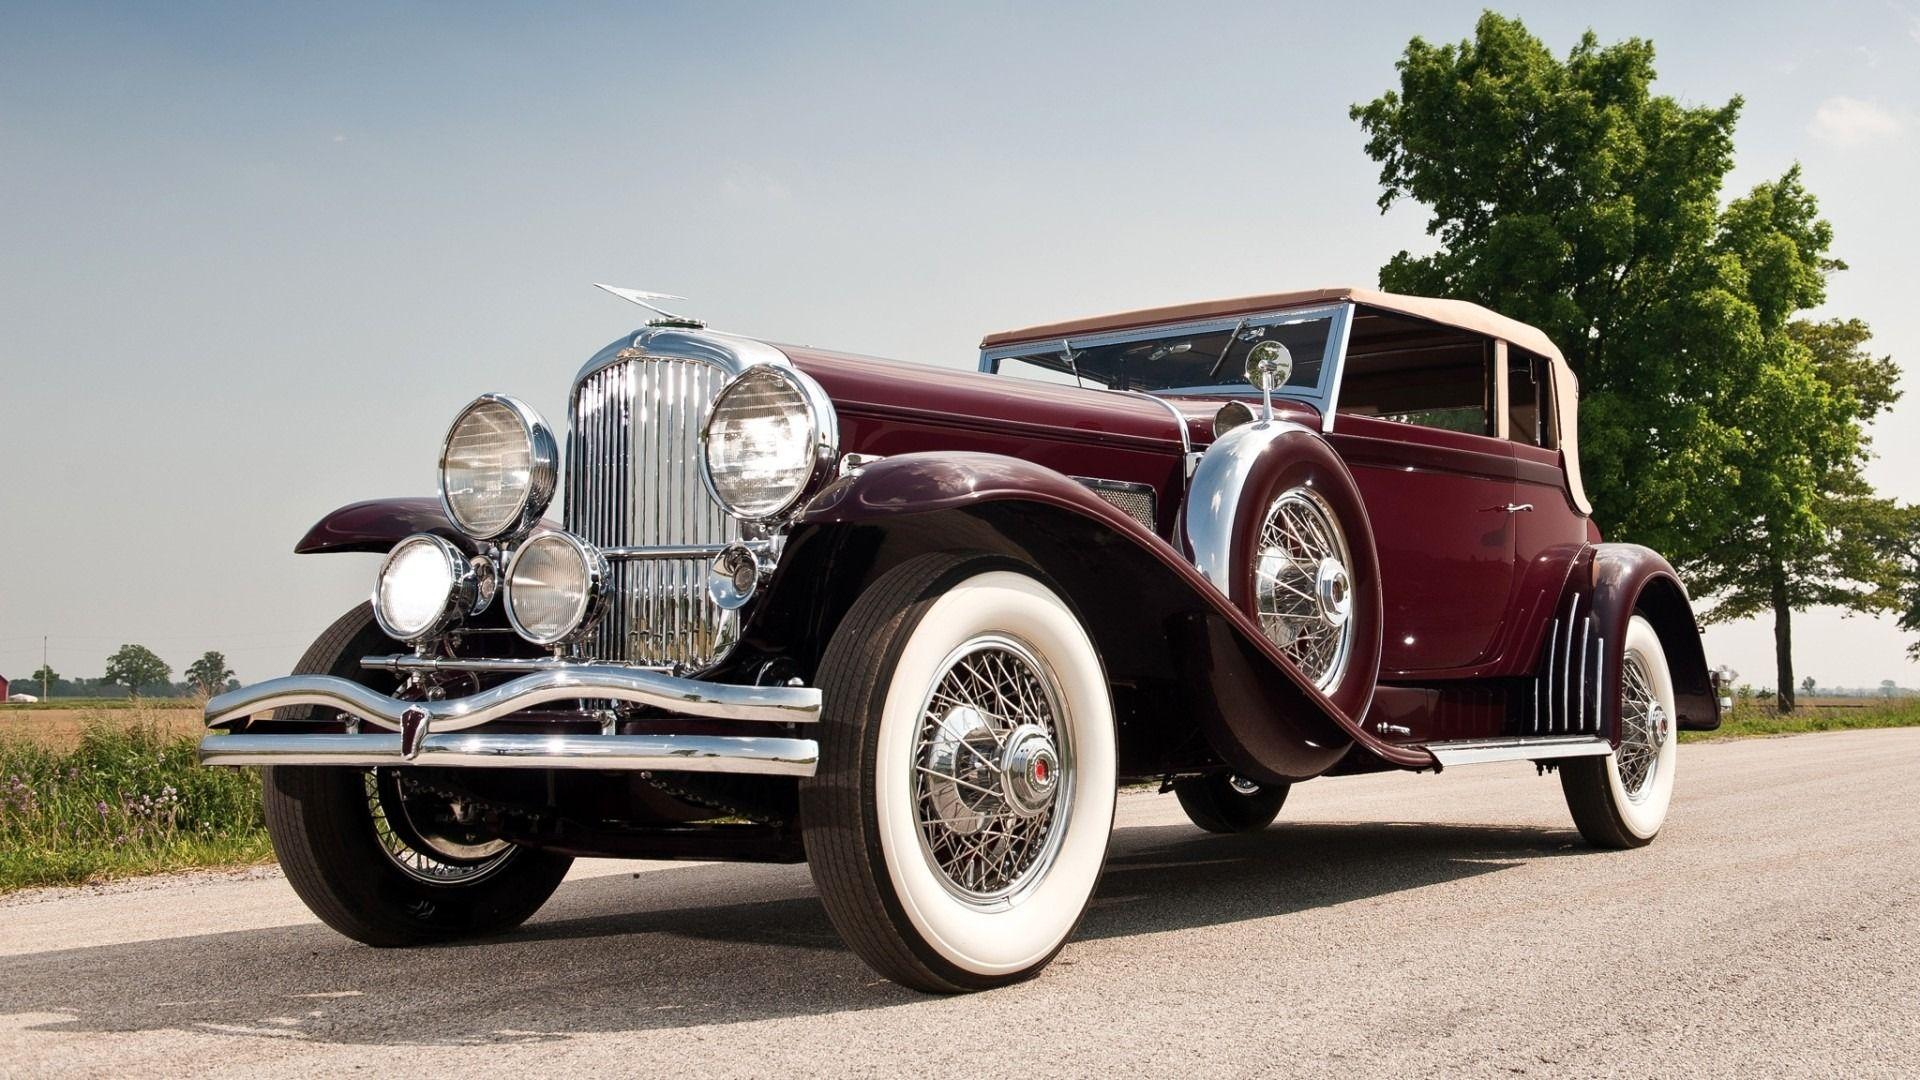 Duesenberg HD Wallpapers 1080p Classic Cars Cars vintage